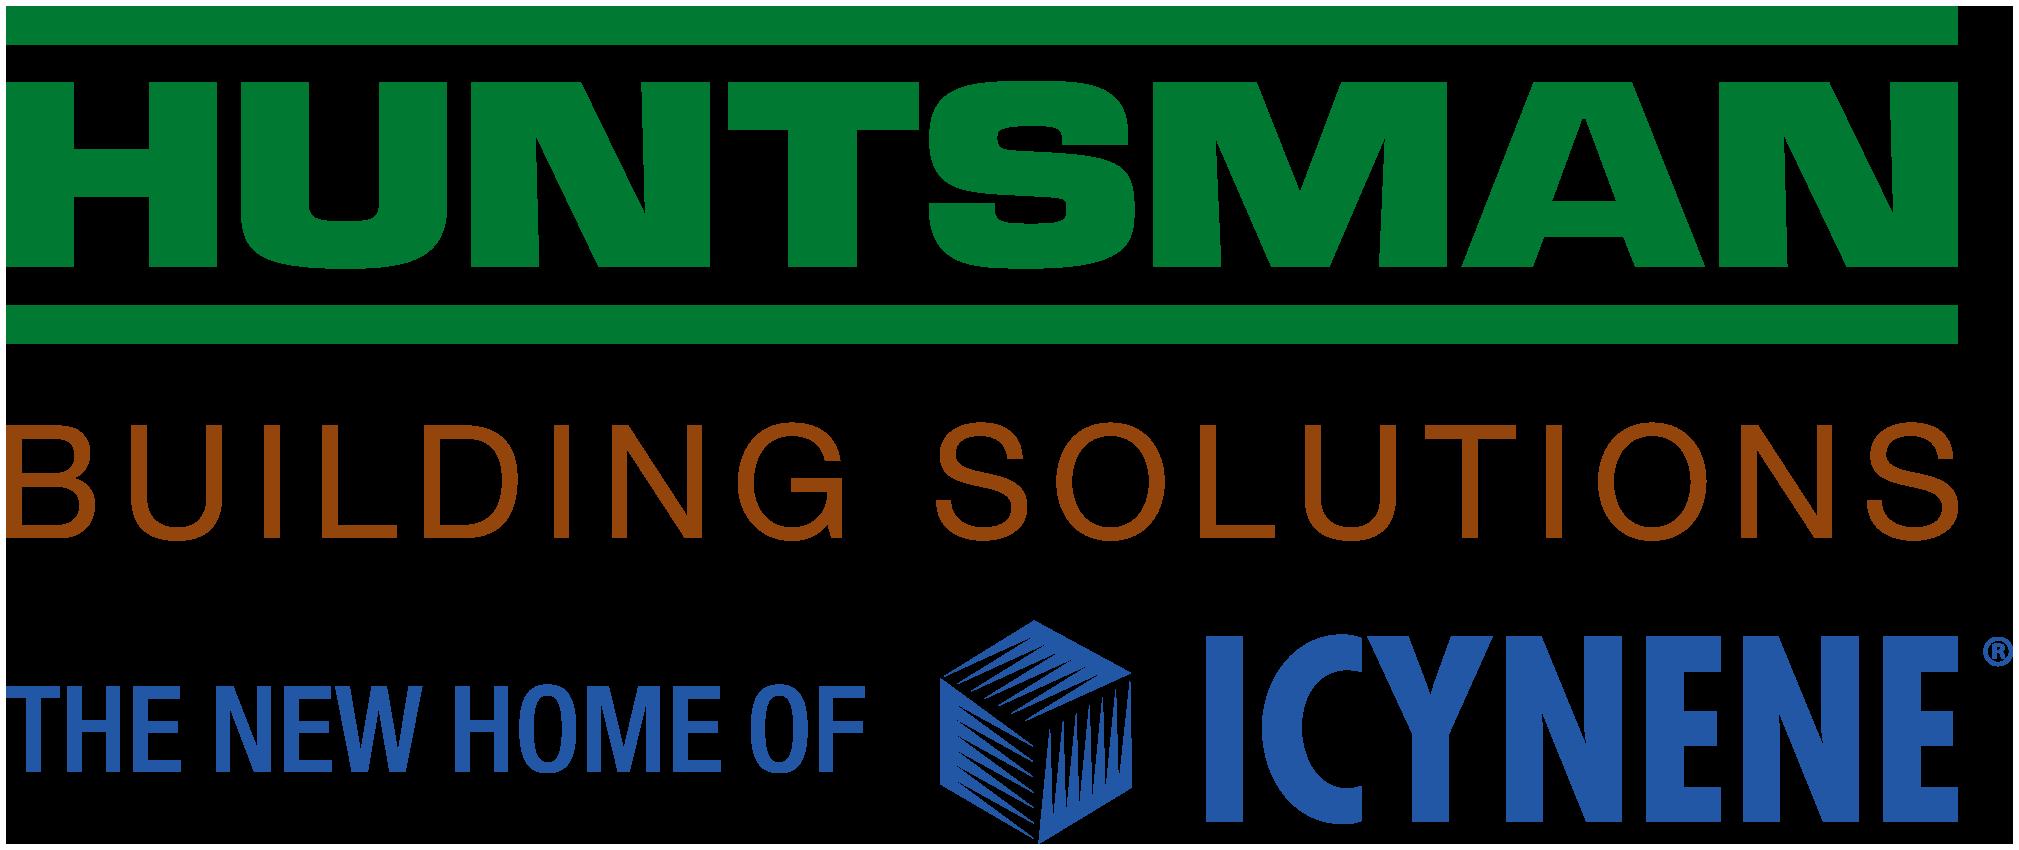 Huntsman Building Solutions ( Icynene )